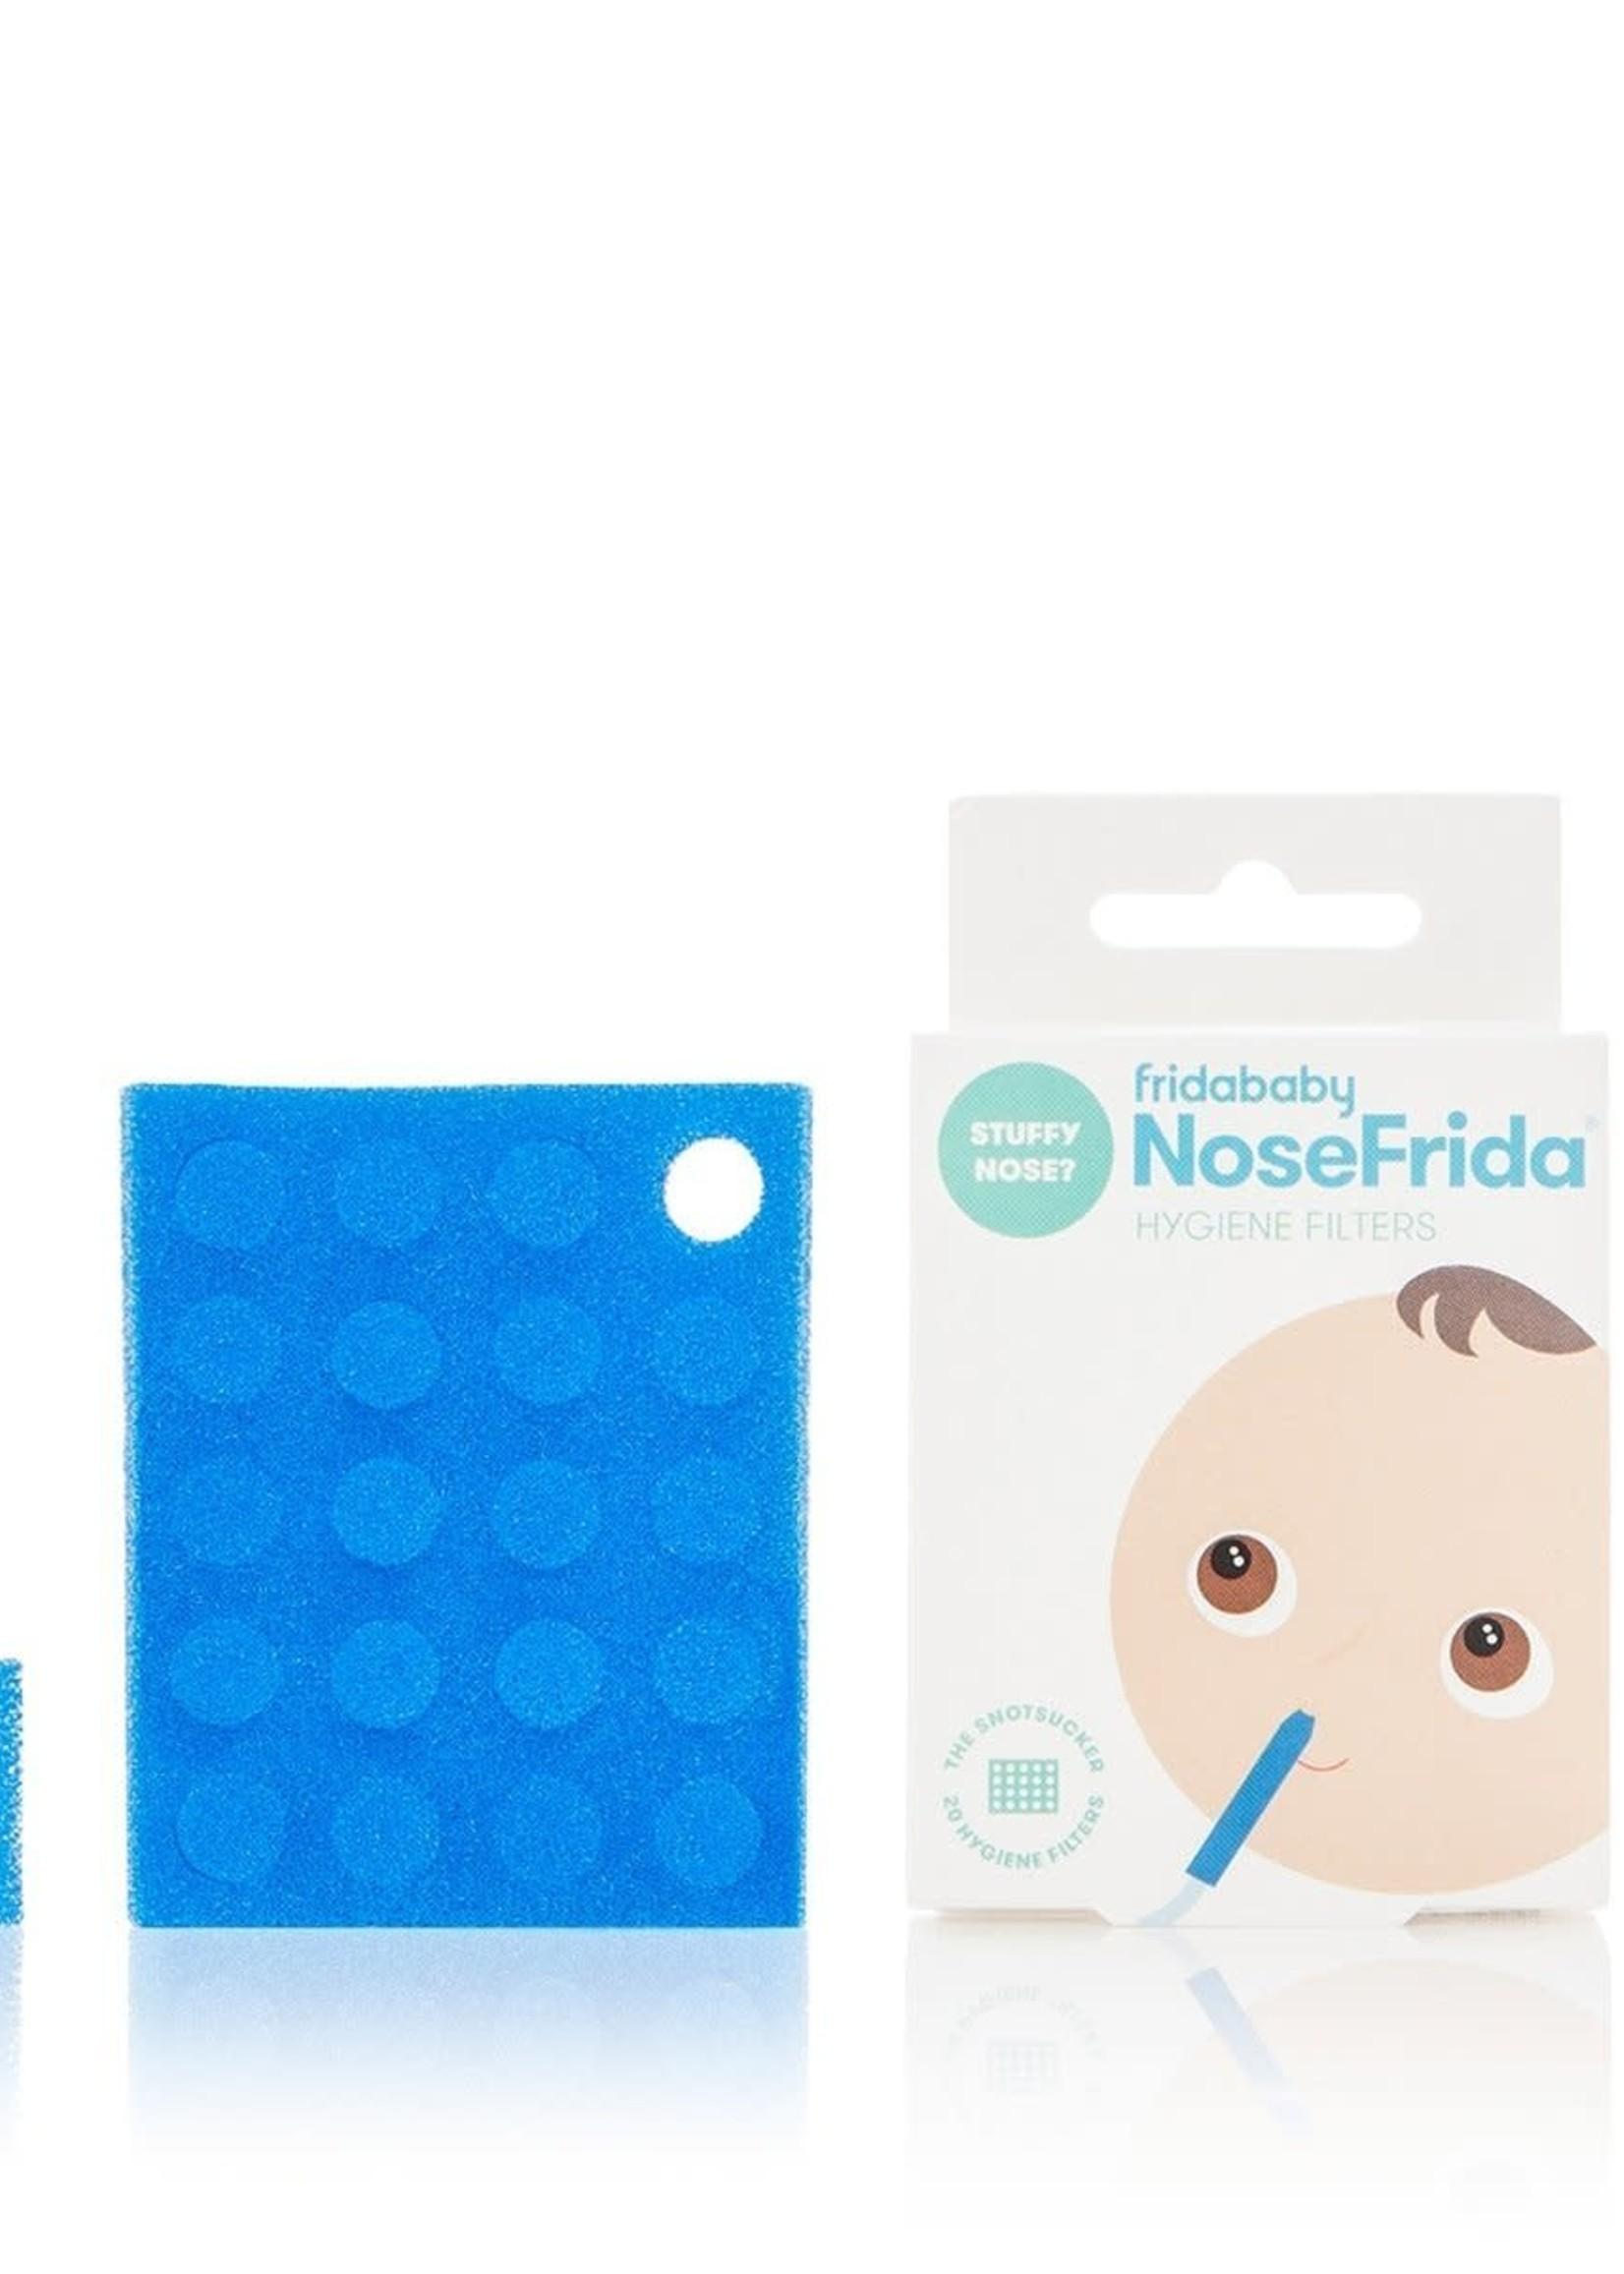 Fridababy nose frida filters